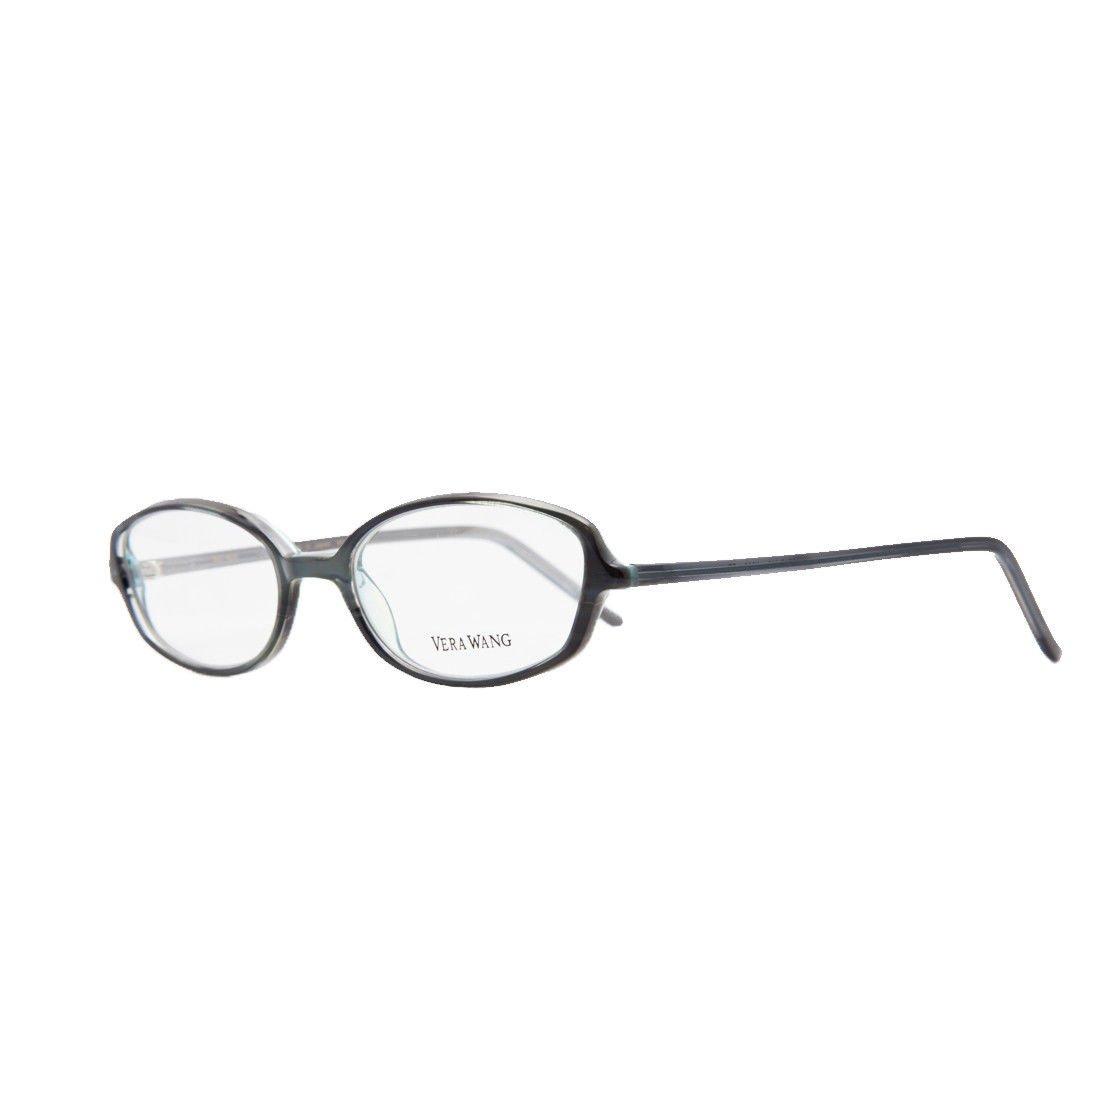 VERA WANG Eyeglasses V006 Demi Gray